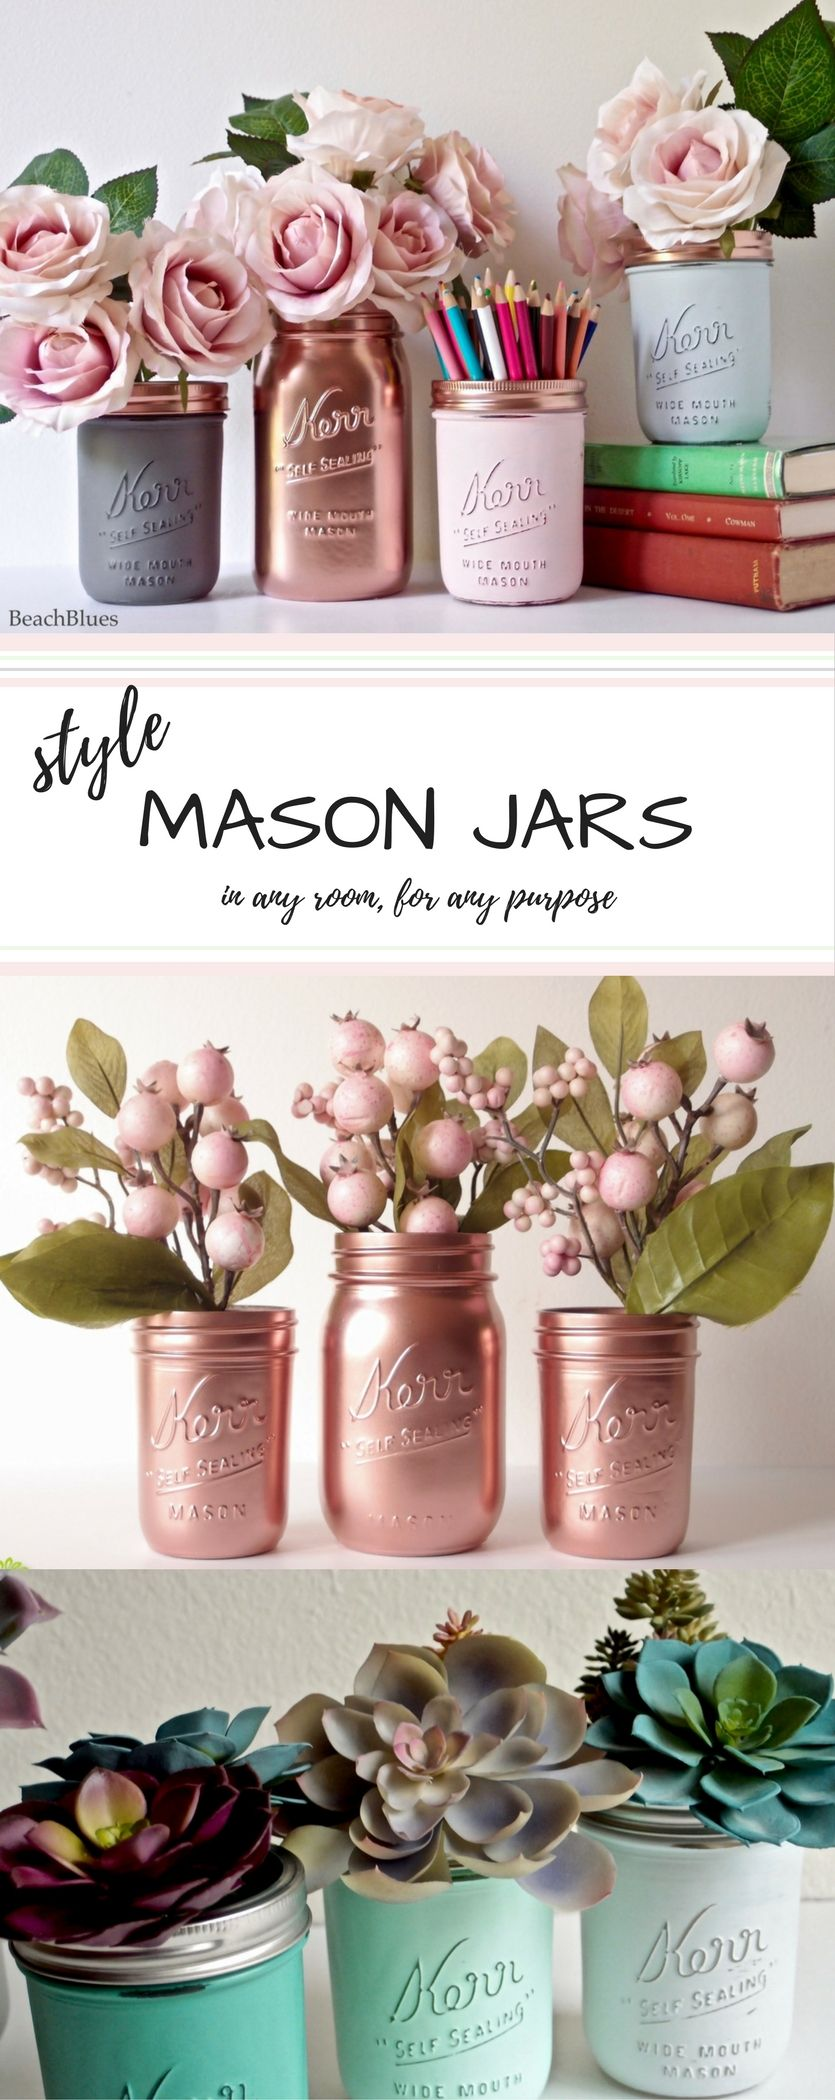 Blush dorm decor pink copper mint jade silver painted mason